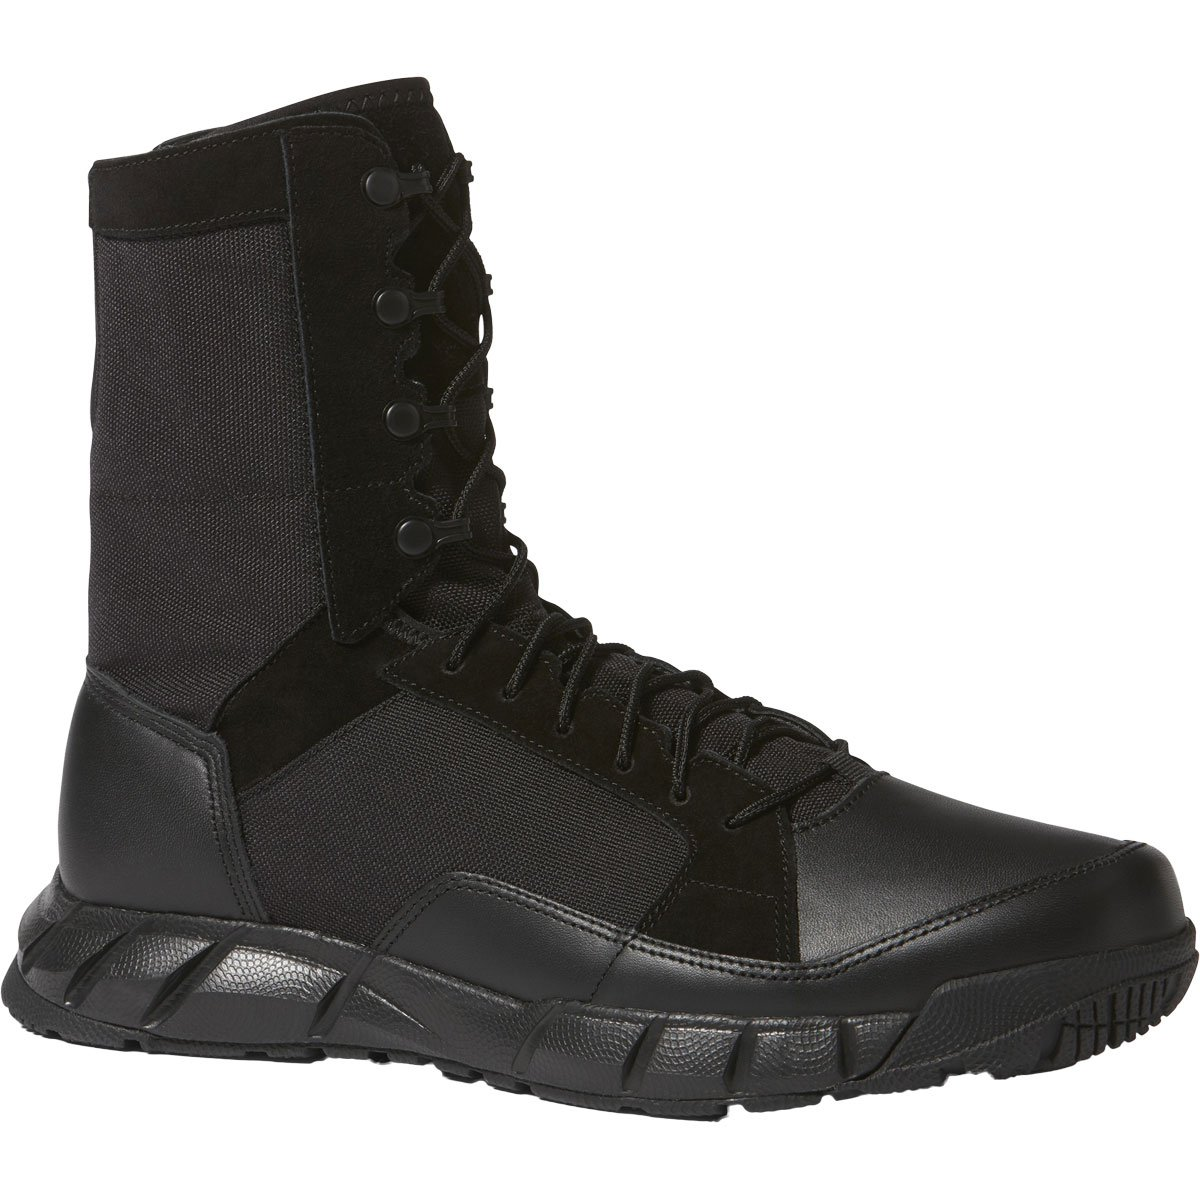 Oakley Mens SI Light Patrol Boots, Blackout, 8.5